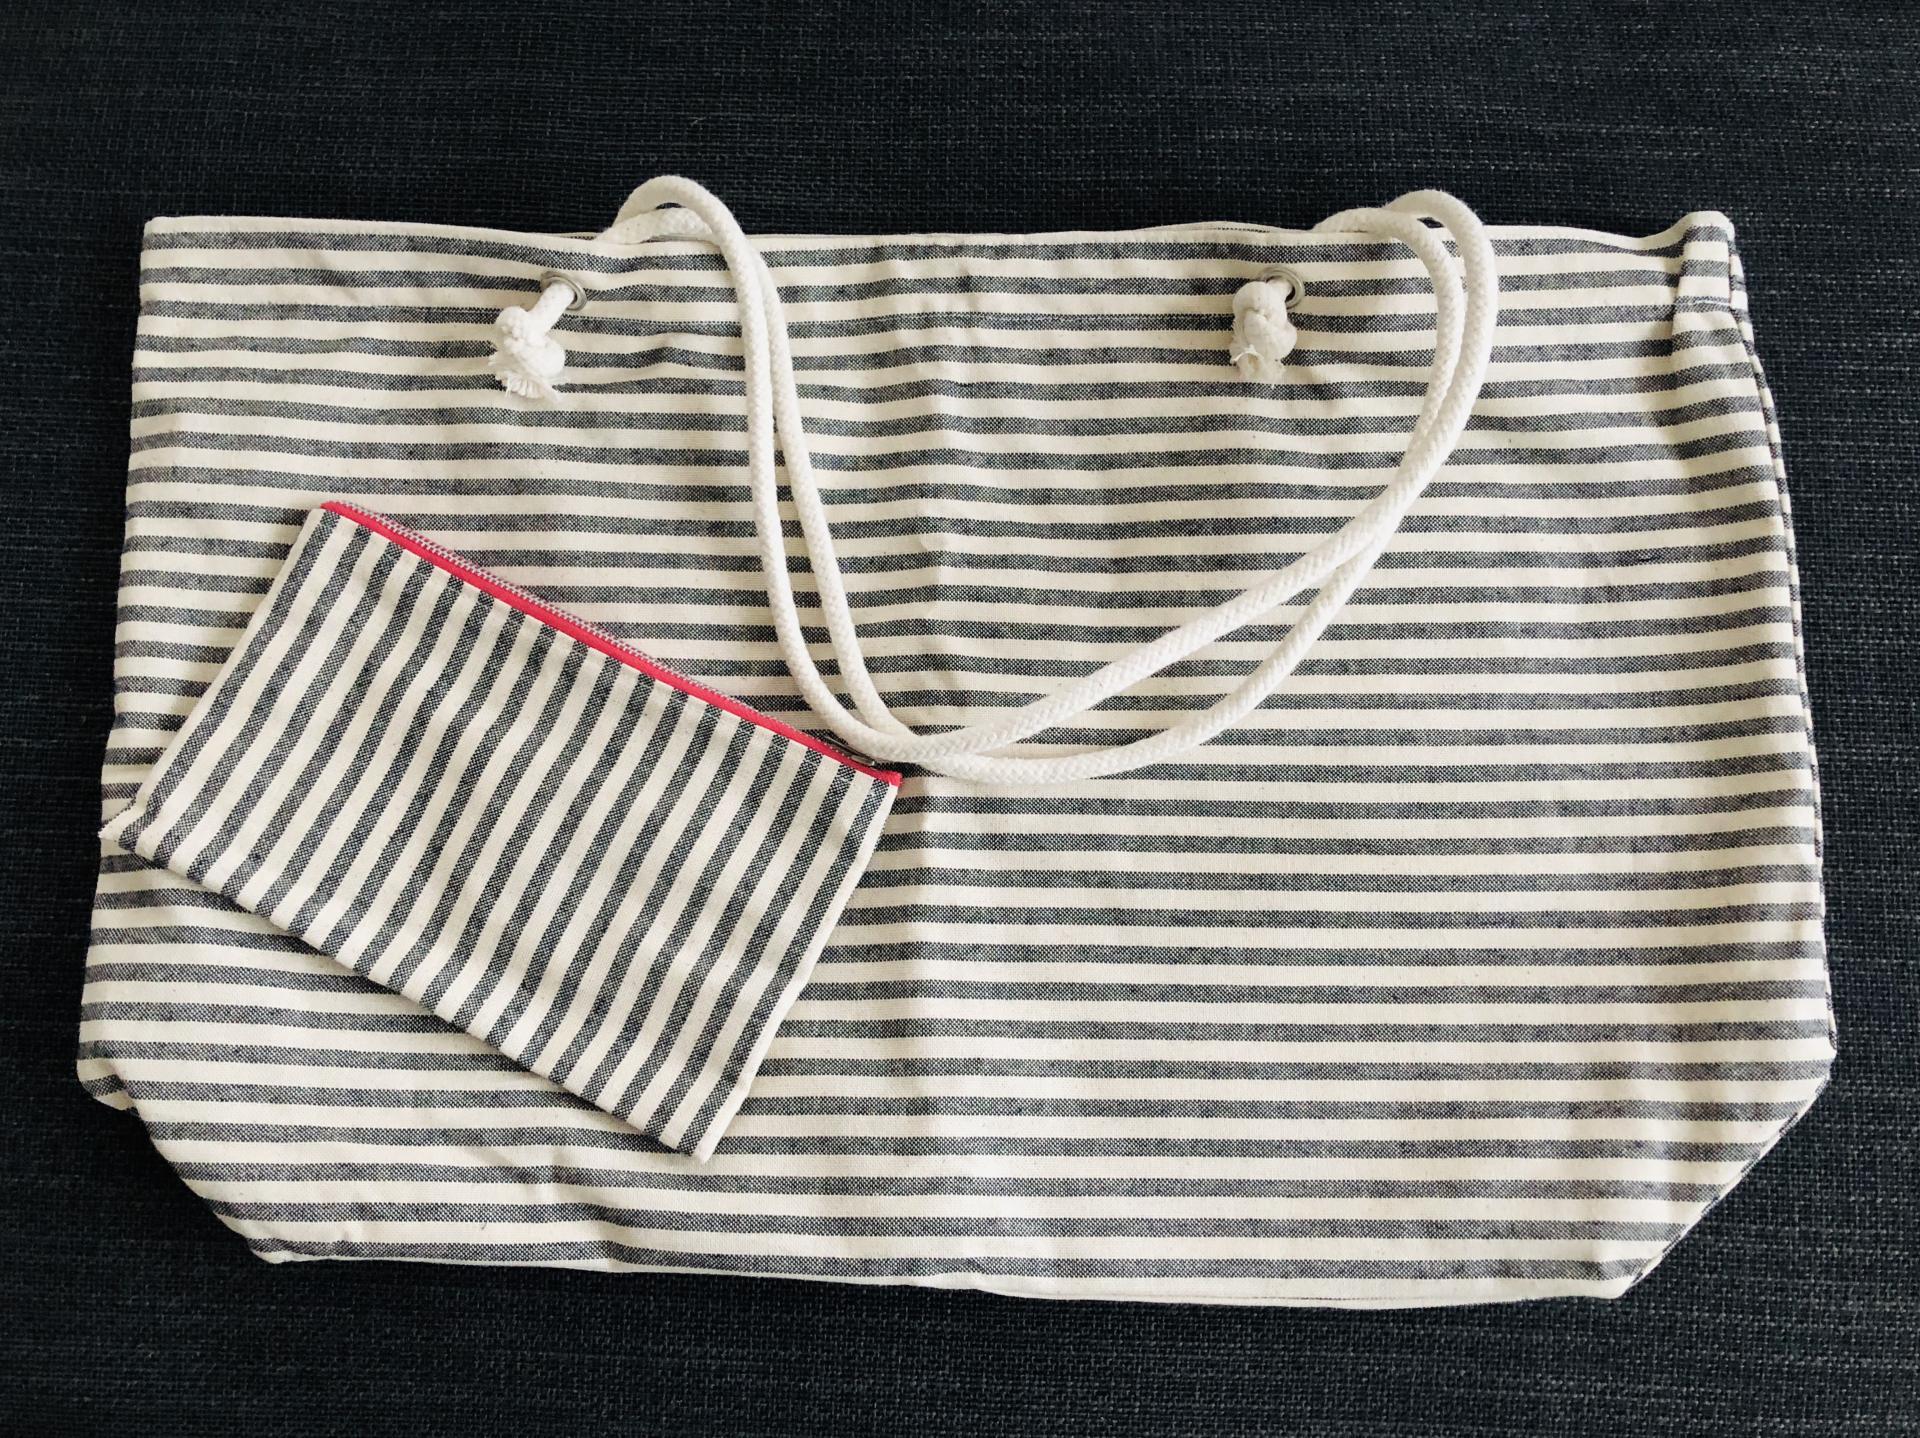 Bolsa XL artesanal con neceser de rayas gris y crudo